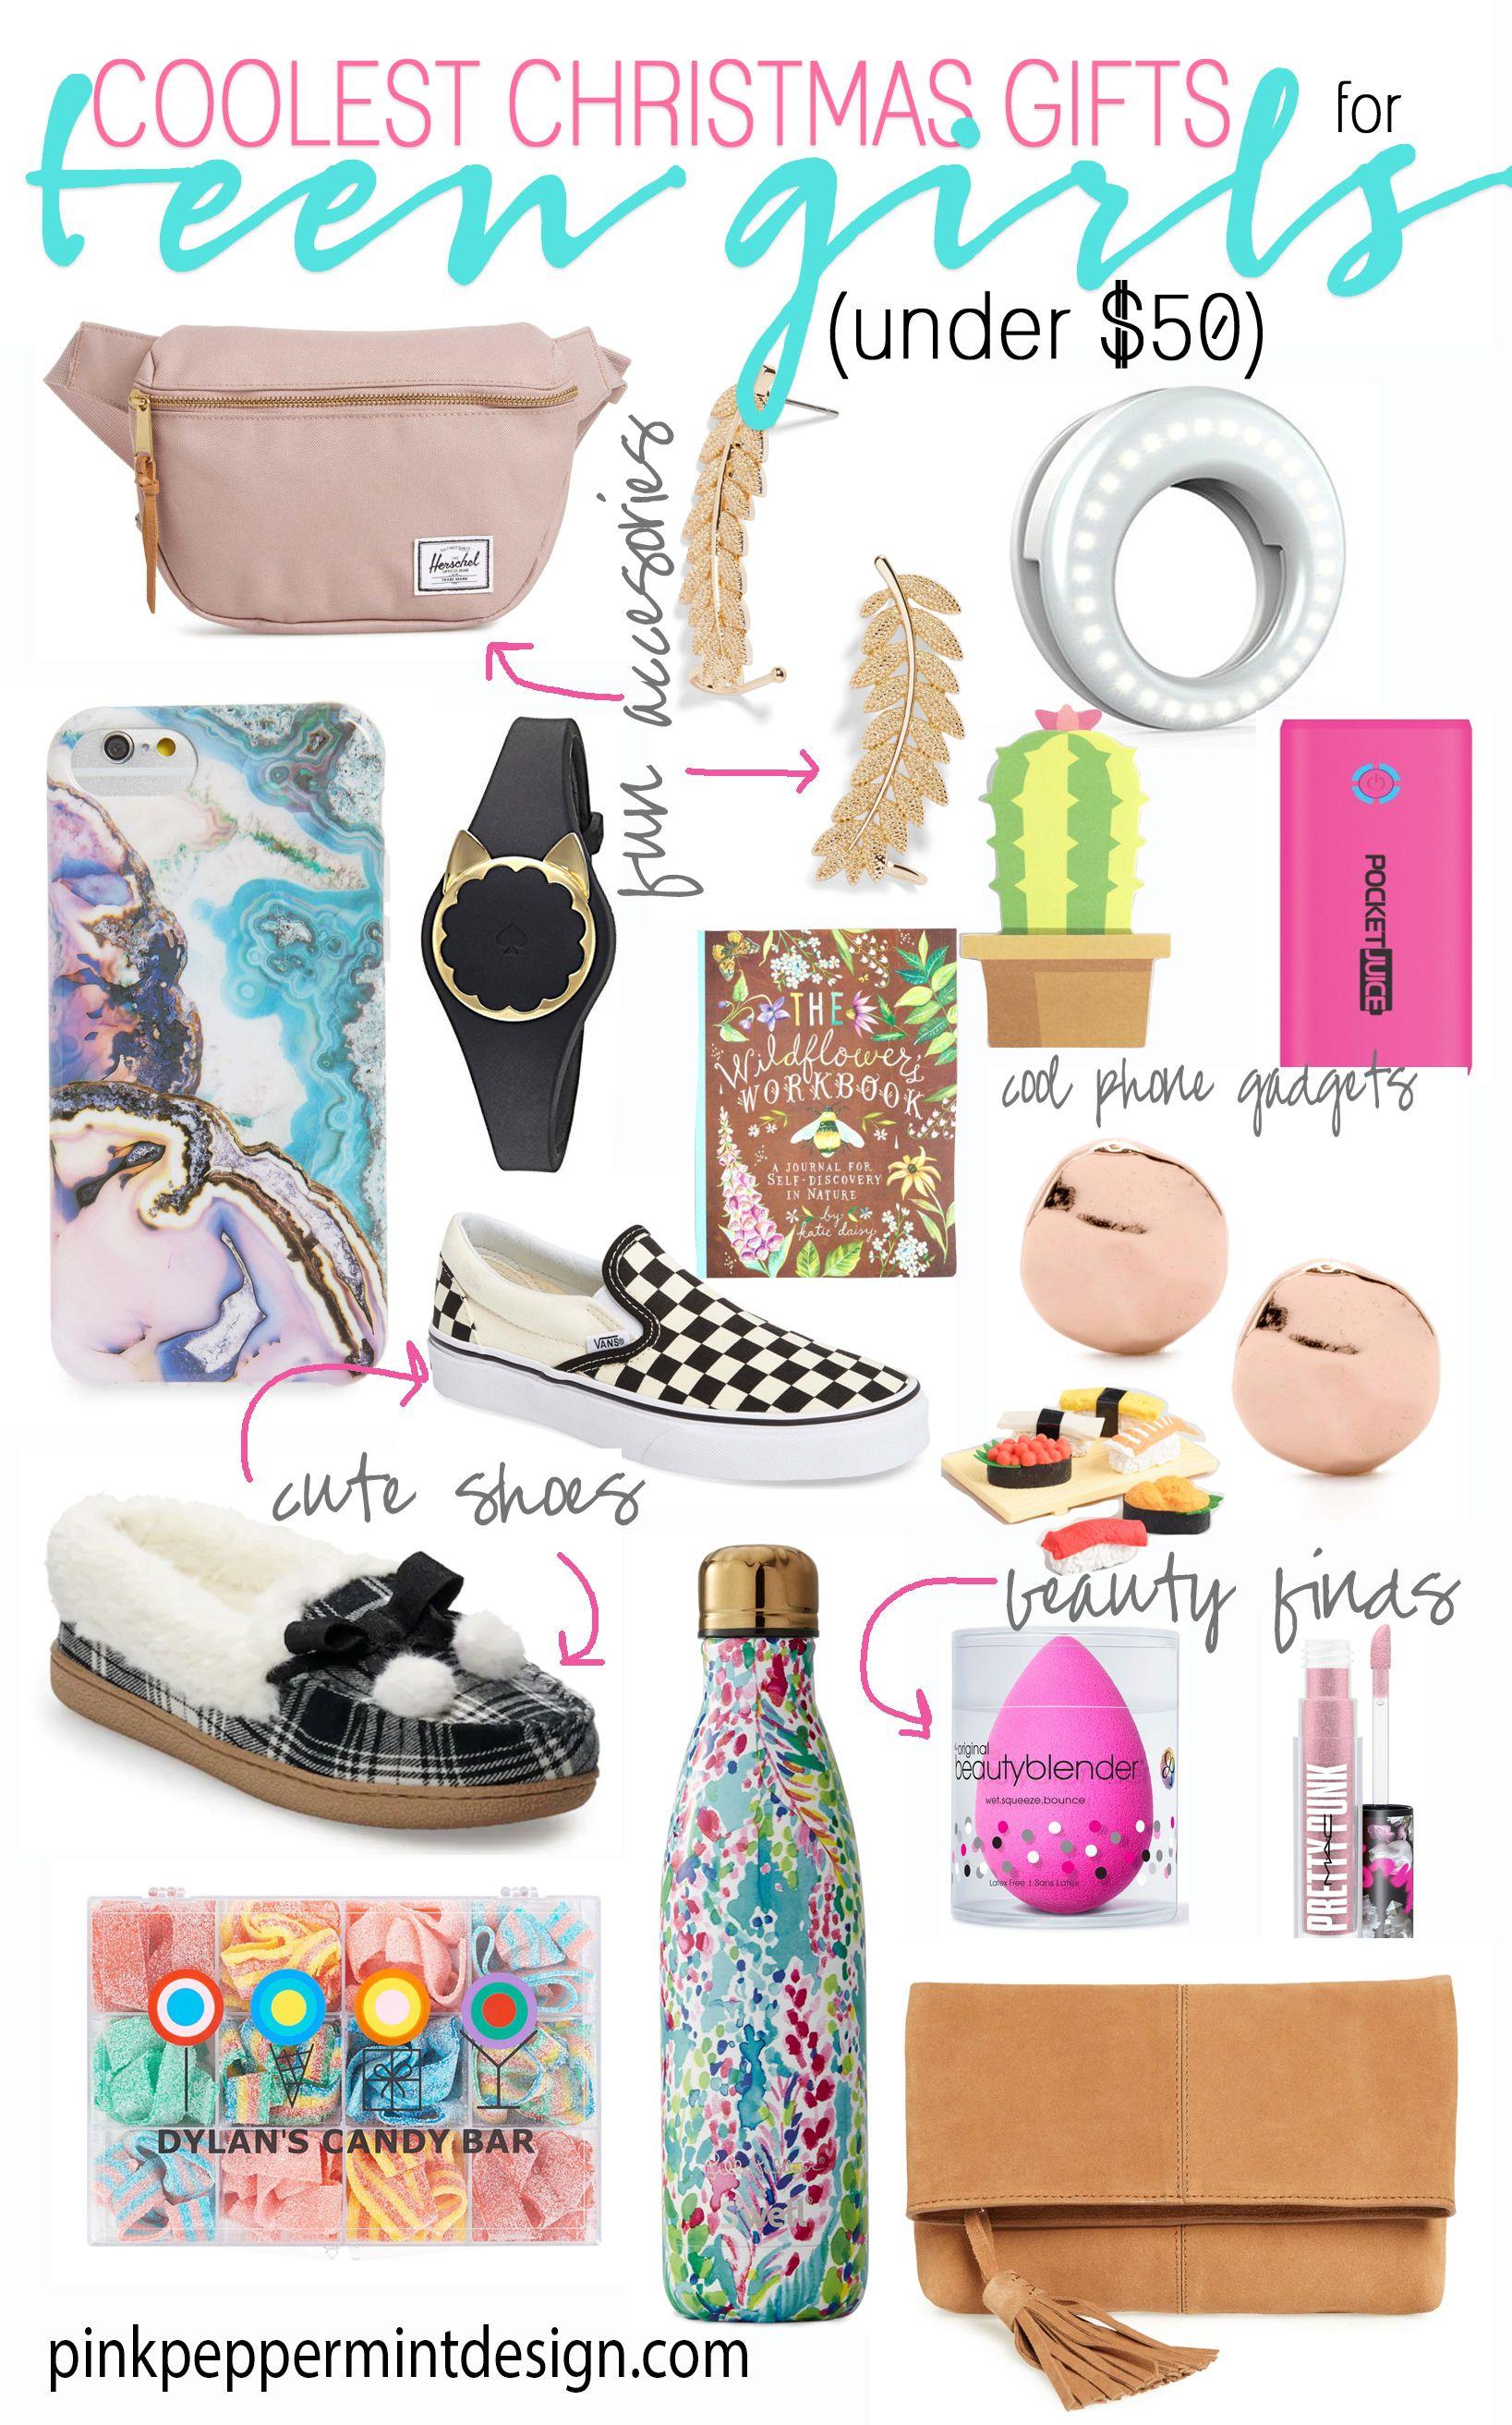 Teenage / Tween Girl Christmas List: Gift Ideas for Teen & Tween Girls